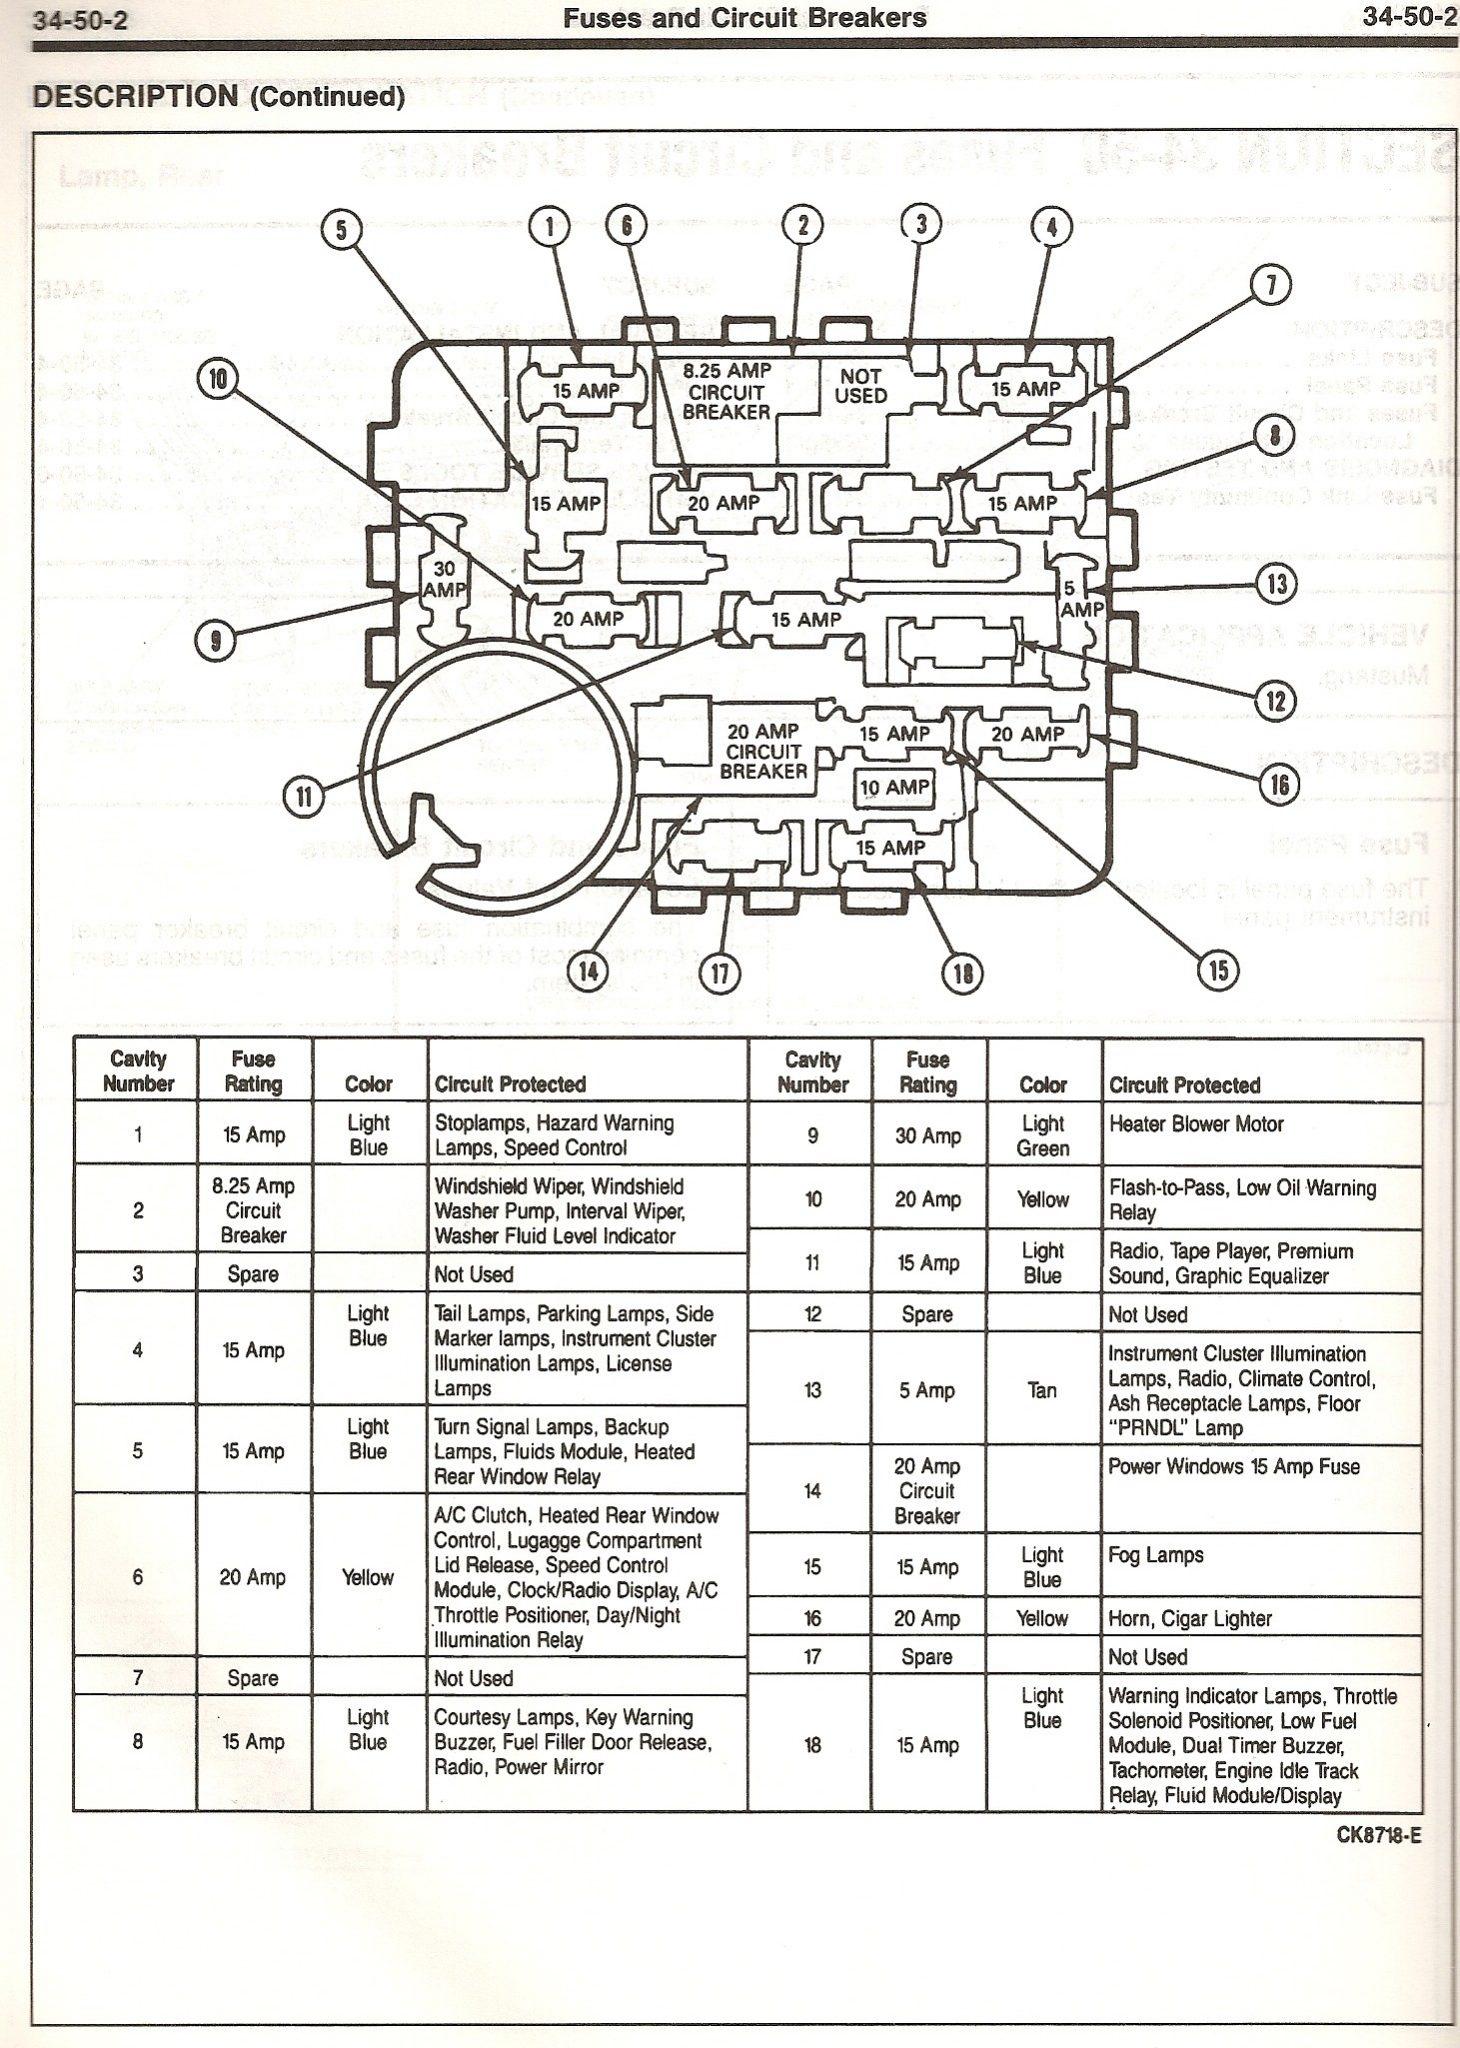 89 Thunderbird Fuse Box | Wiring Diagram on